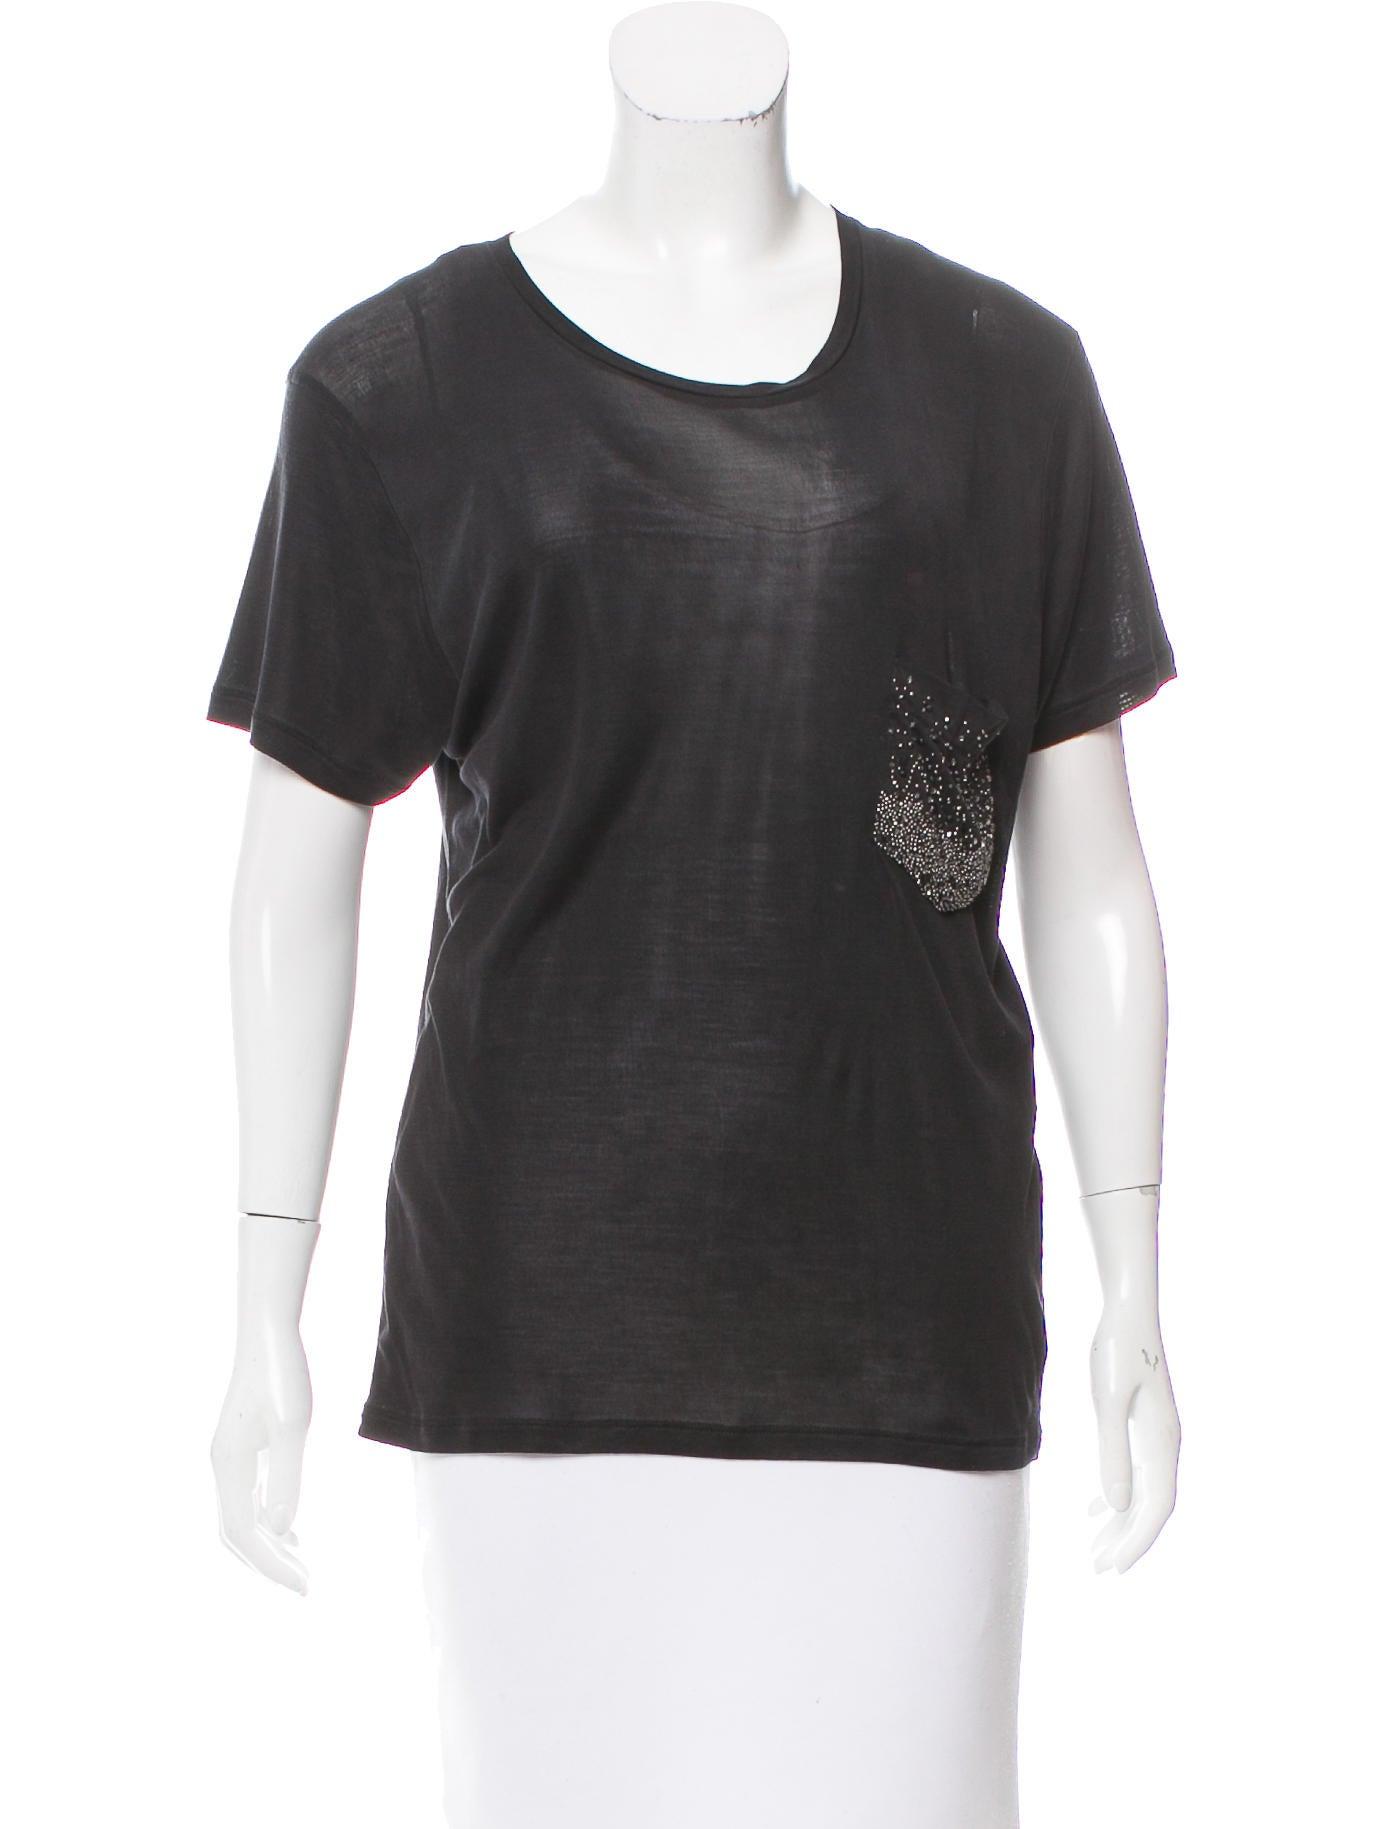 Saint laurent embellished silk t shirt clothing for Saint laurent shirt womens